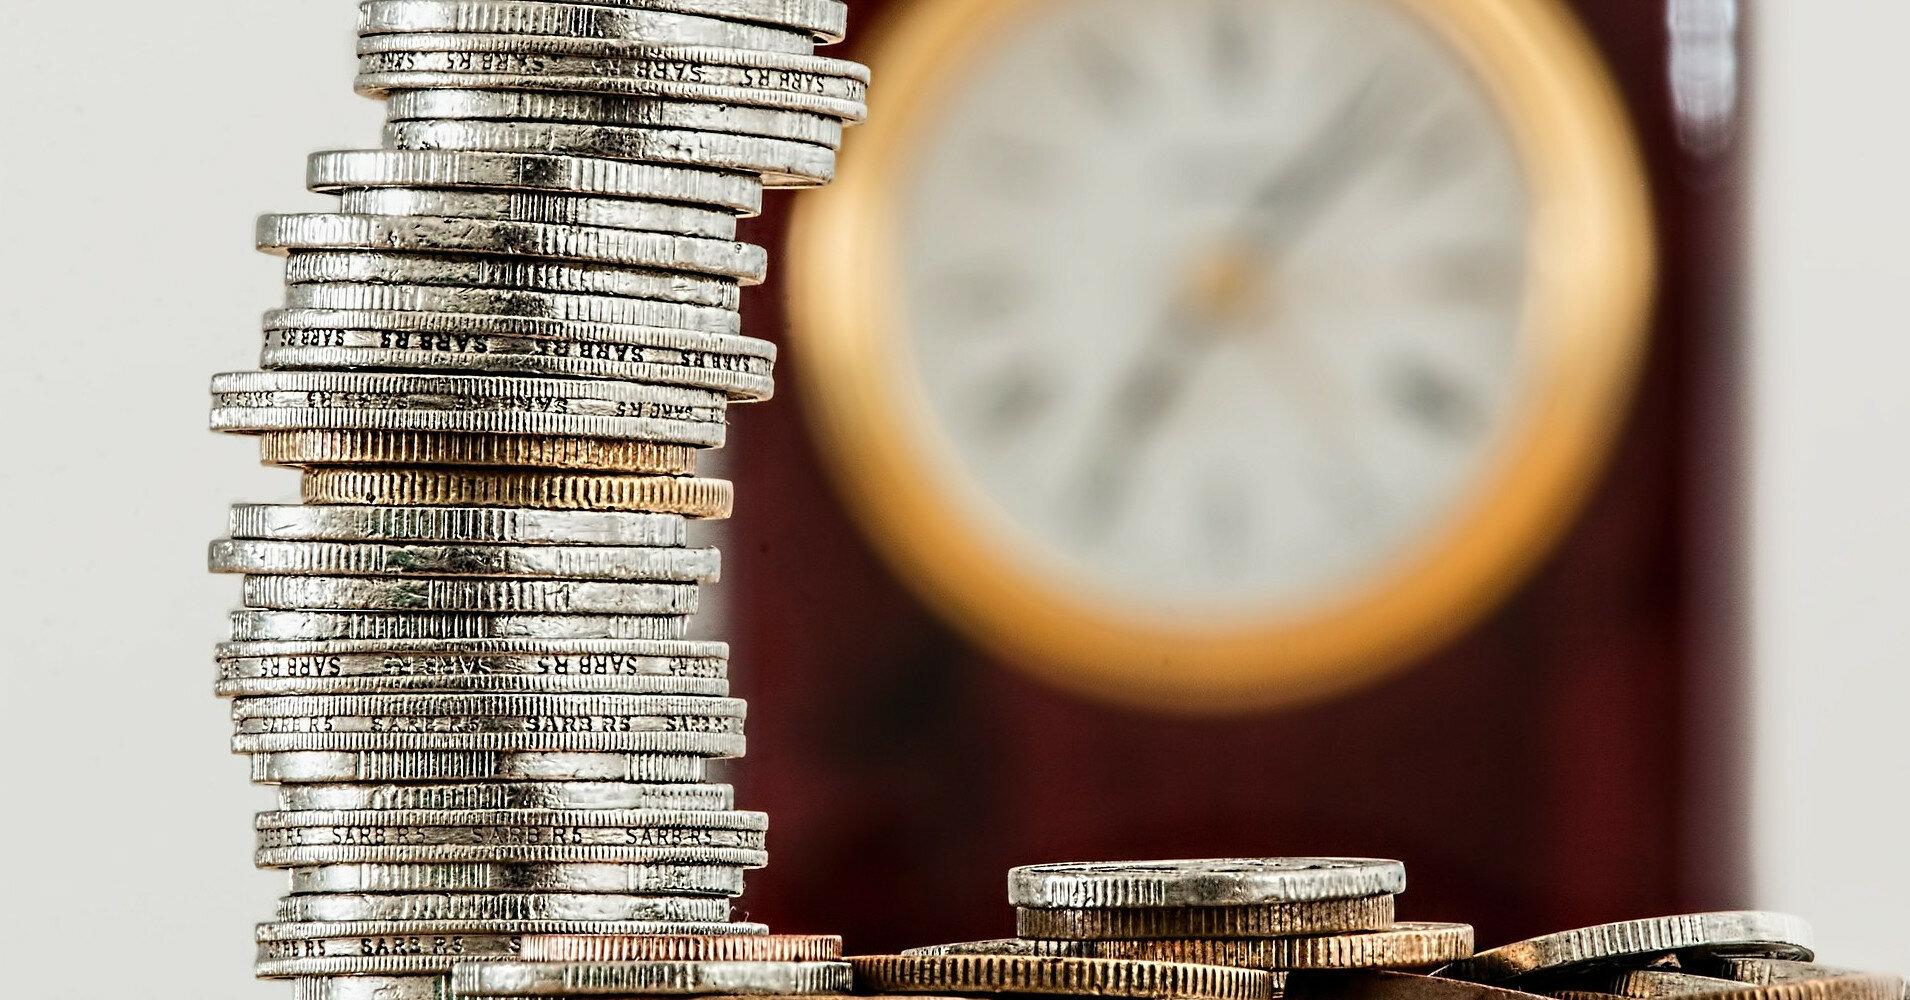 Банки снижают ставки по депозитам